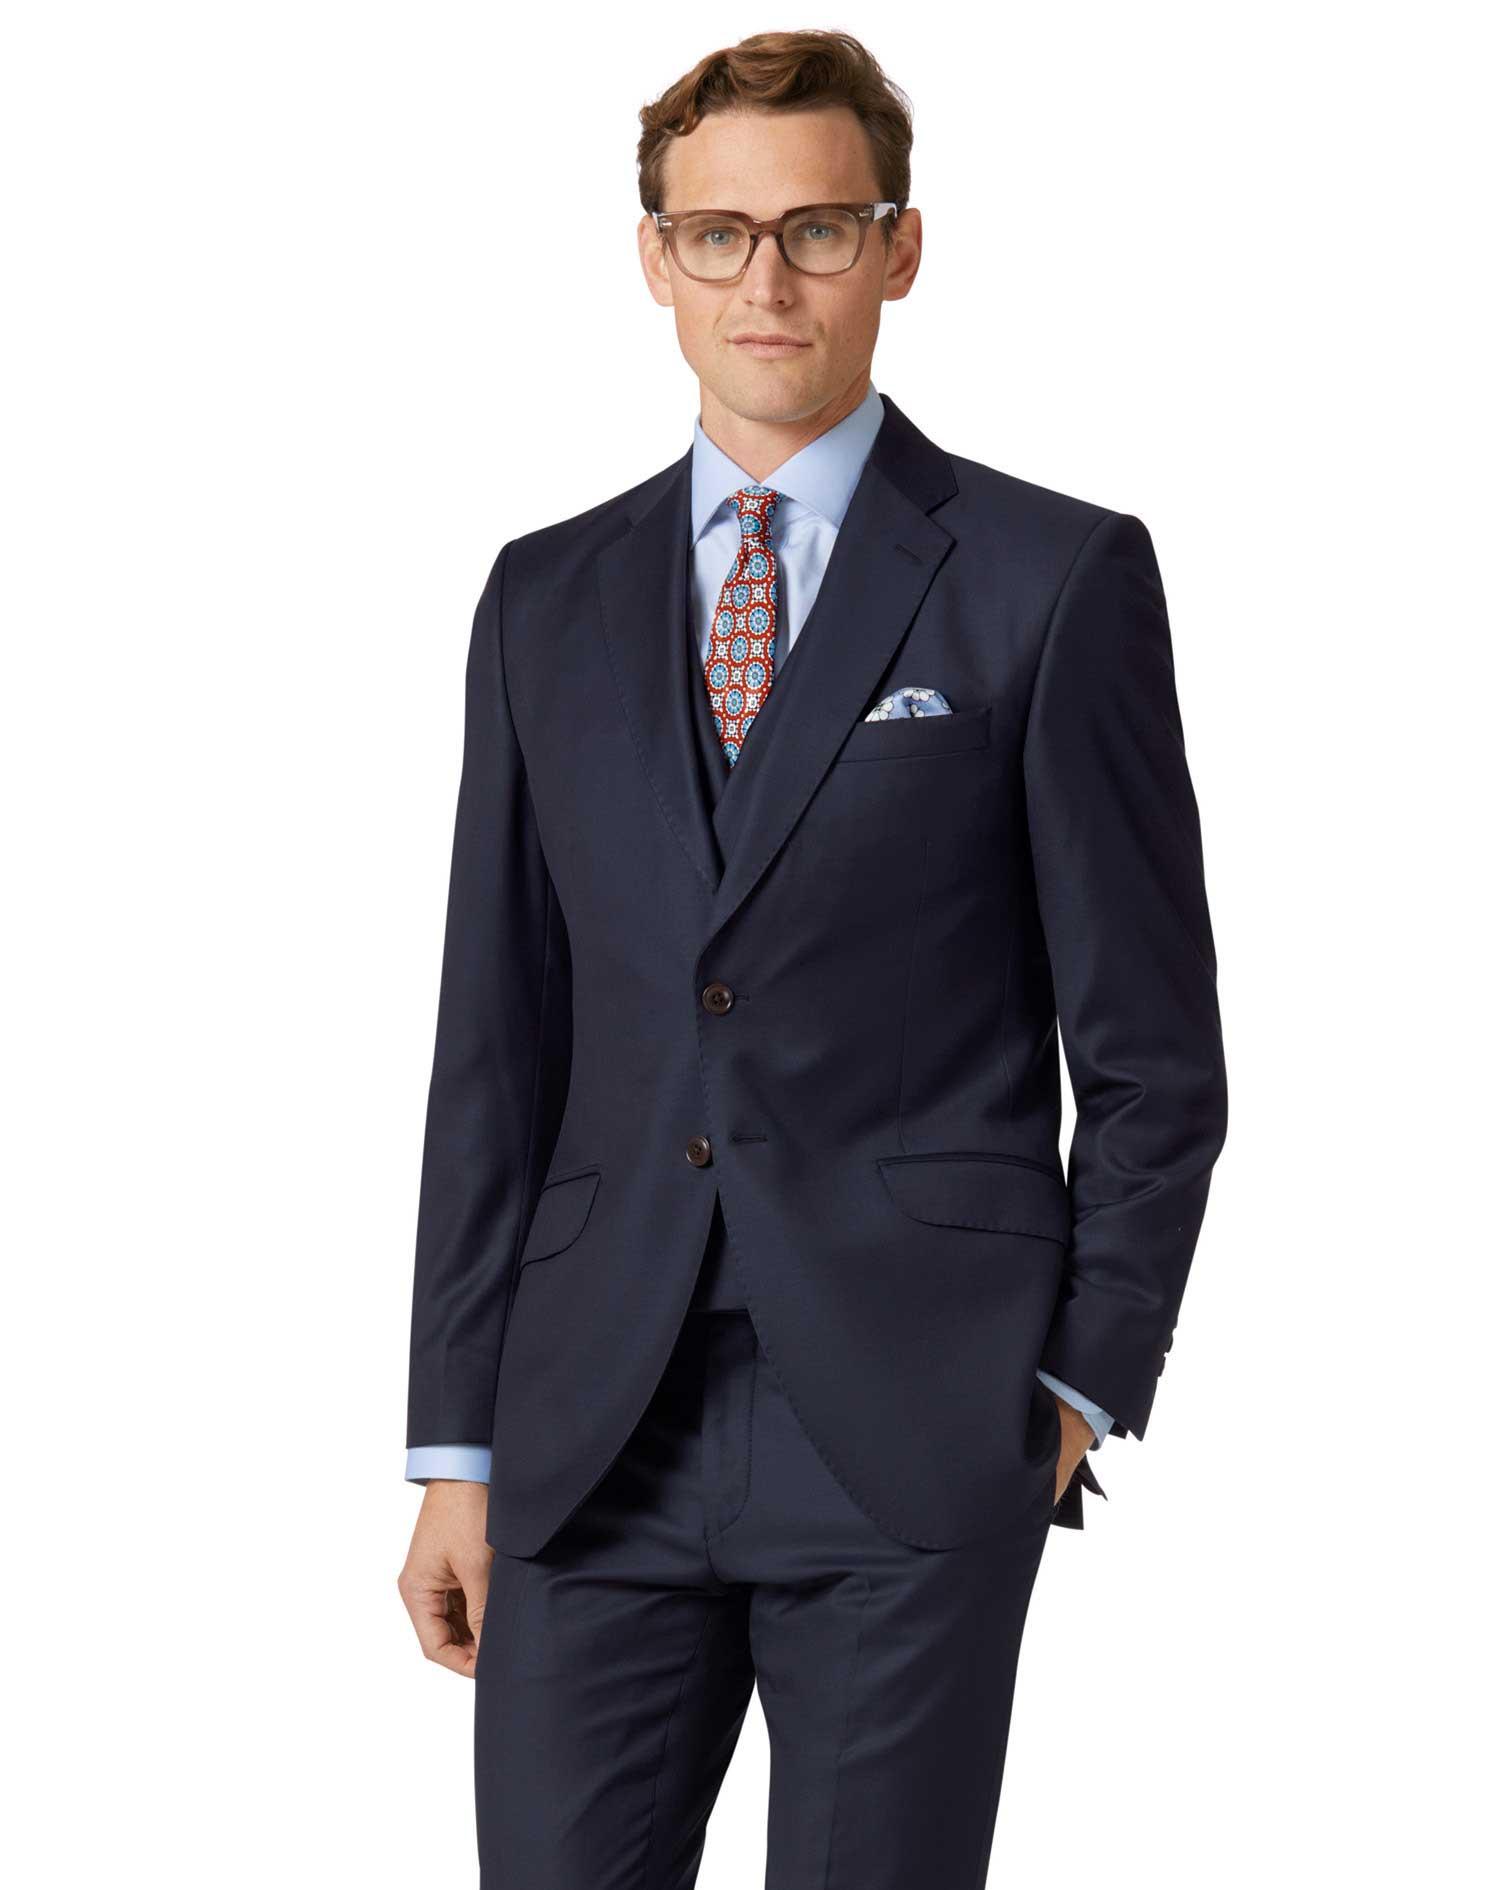 Navy Slim Fit Italian Twill Luxury Suit Wool Jacket Size 36 Regular by Charles Tyrwhitt